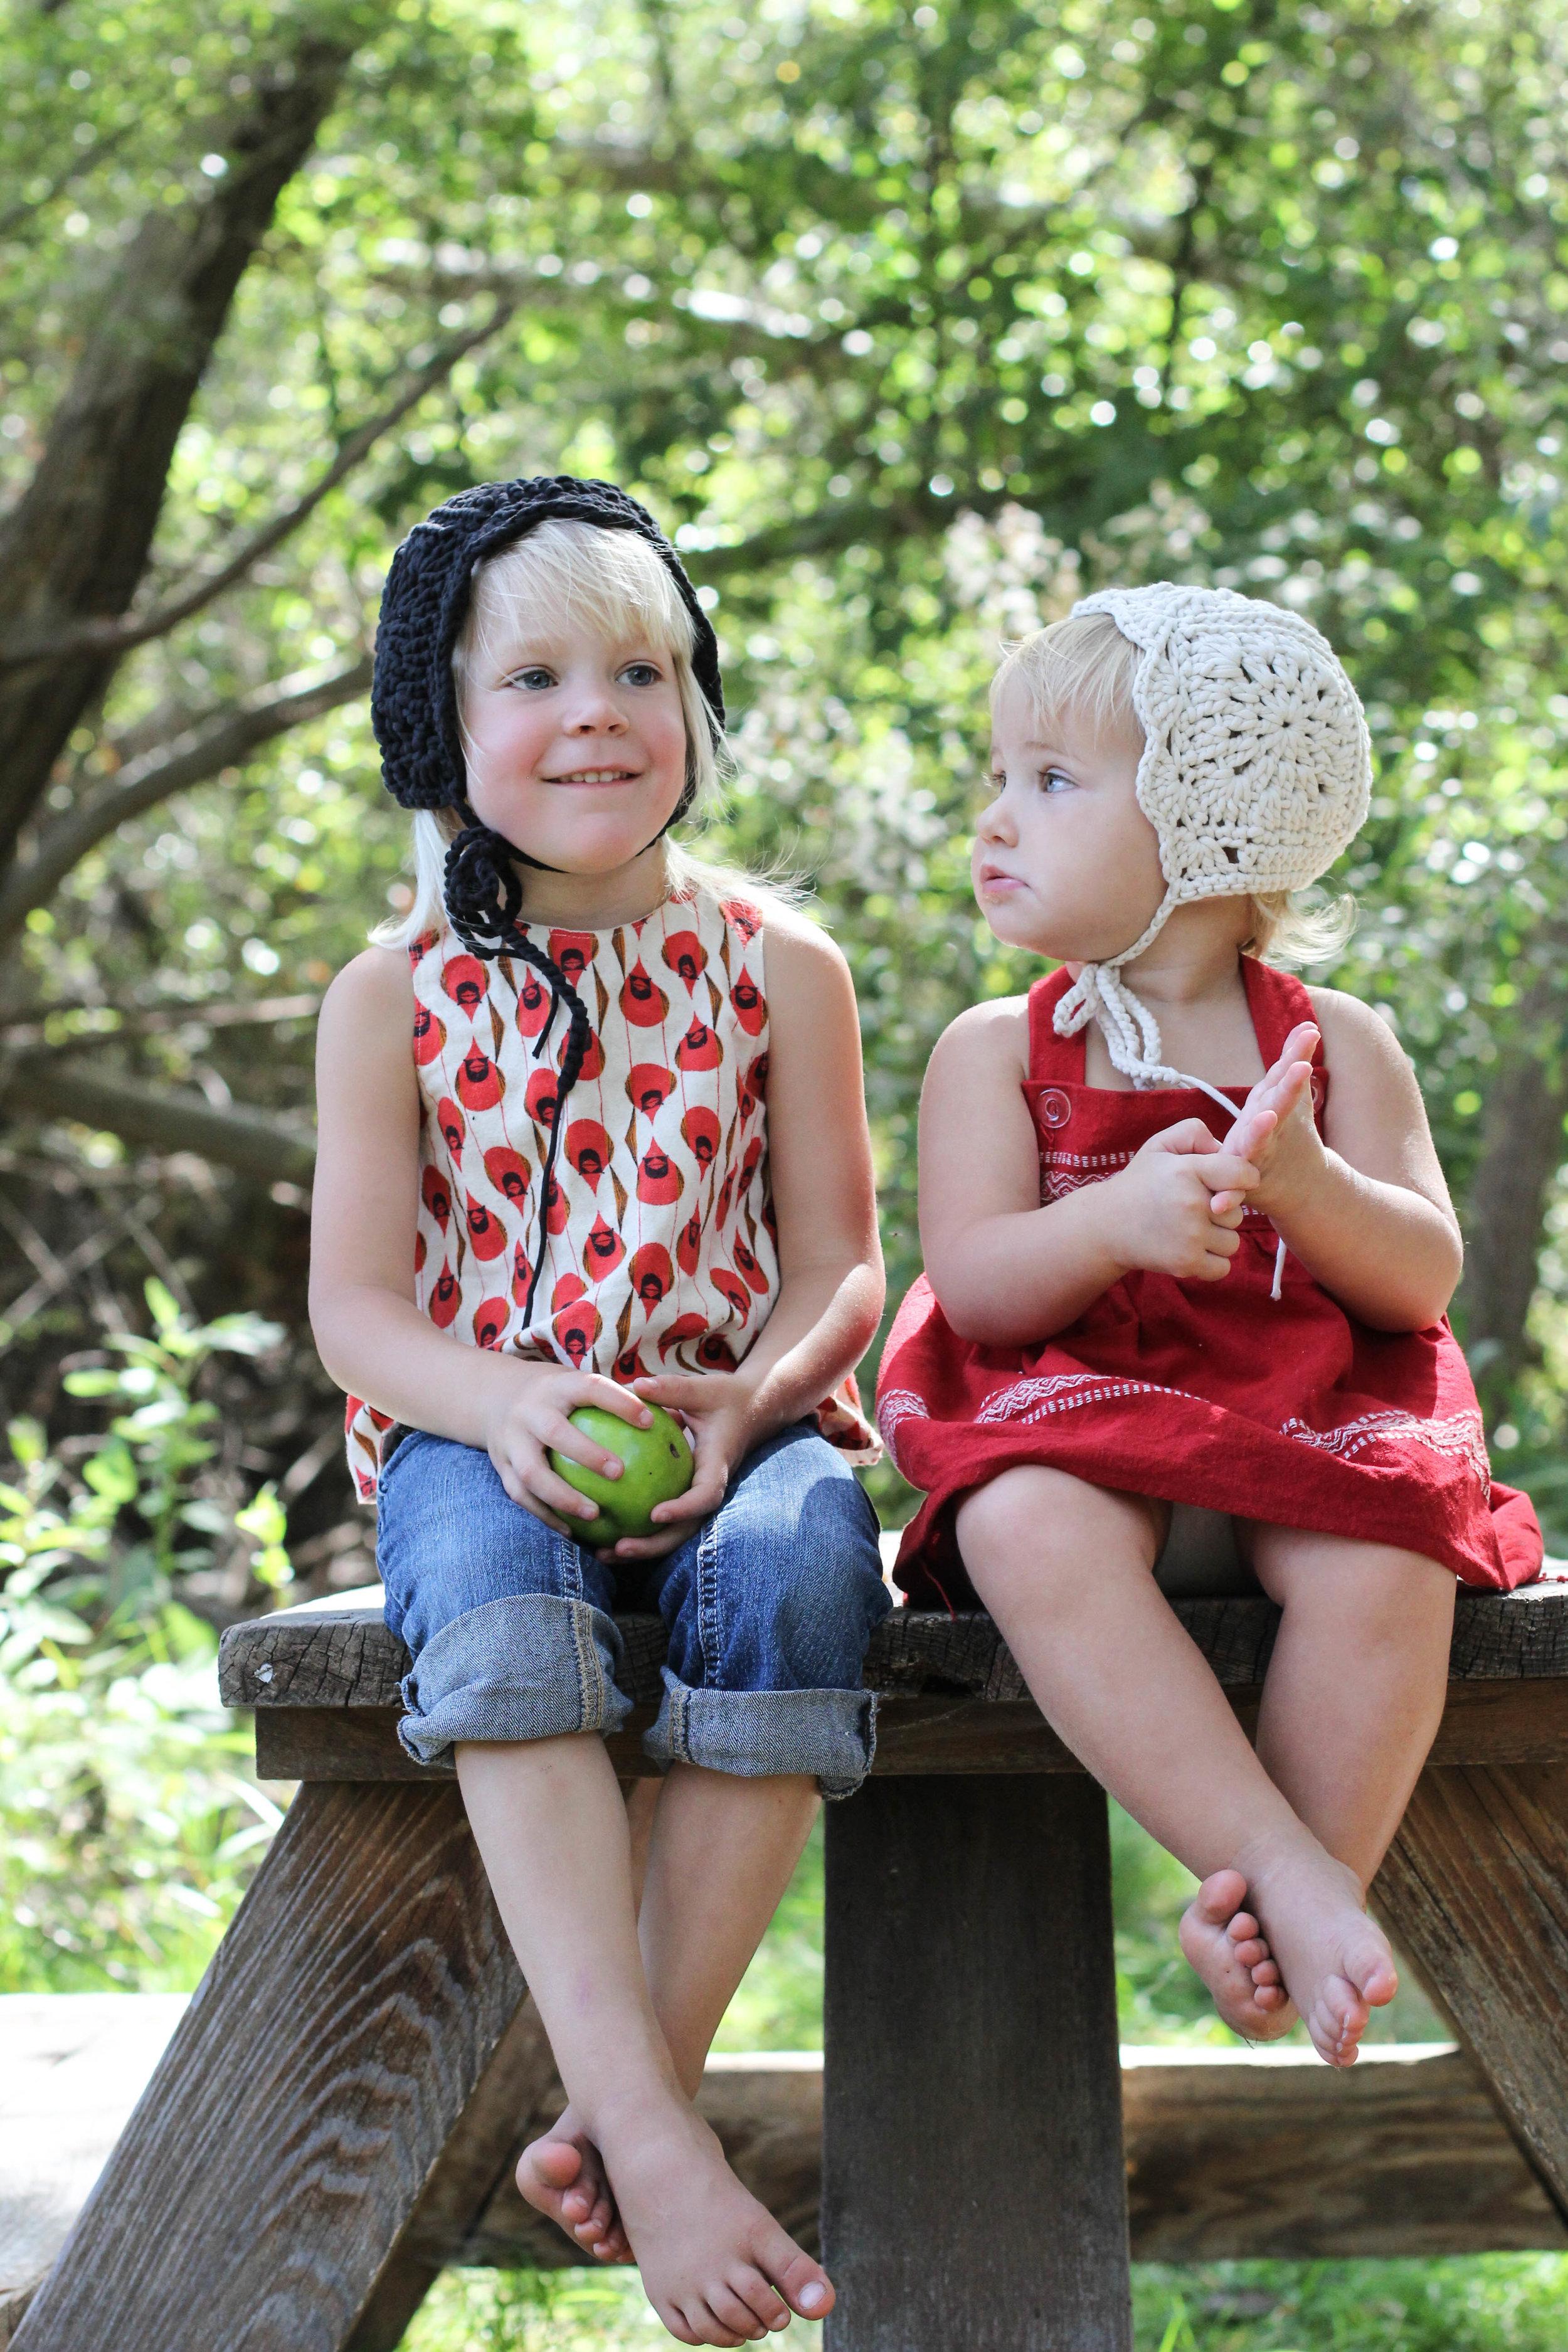 Handmade Crochet Baby Bonnets by Blue Corduroy